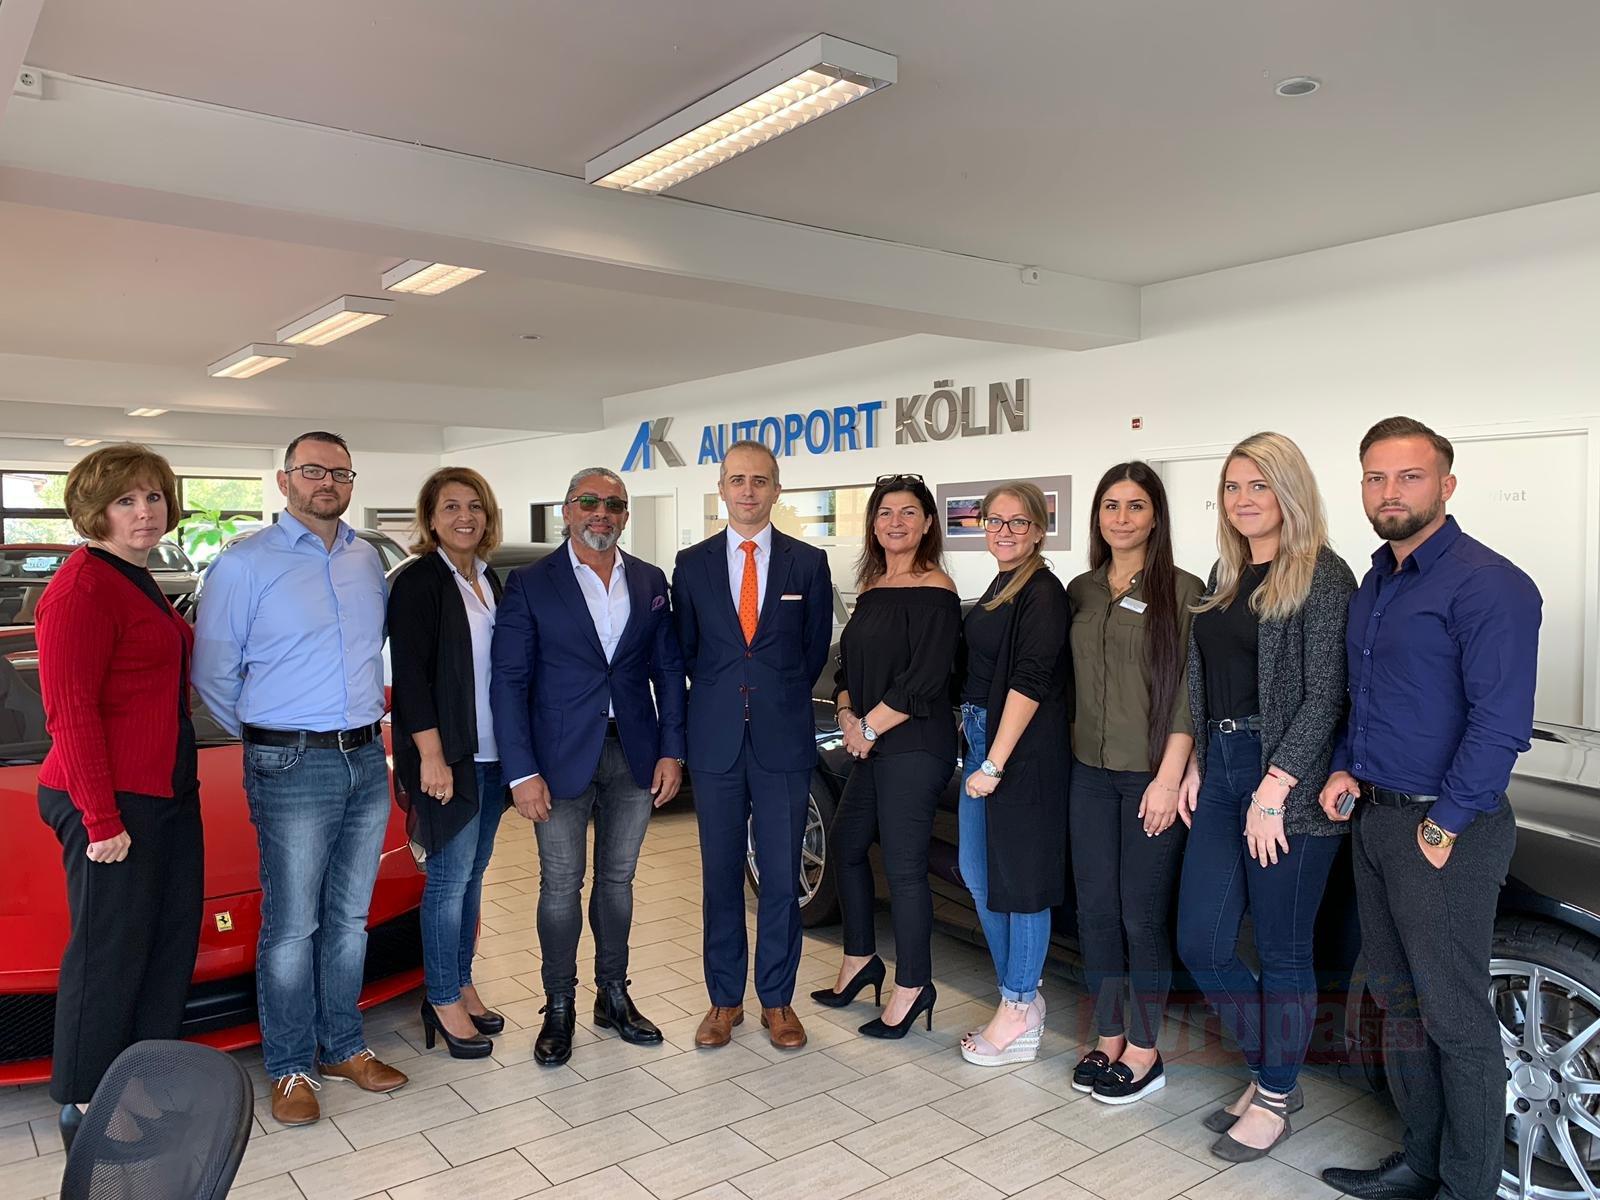 Köln Başkonsolosu Erciyes, AK Autoport'u ziyaret etti